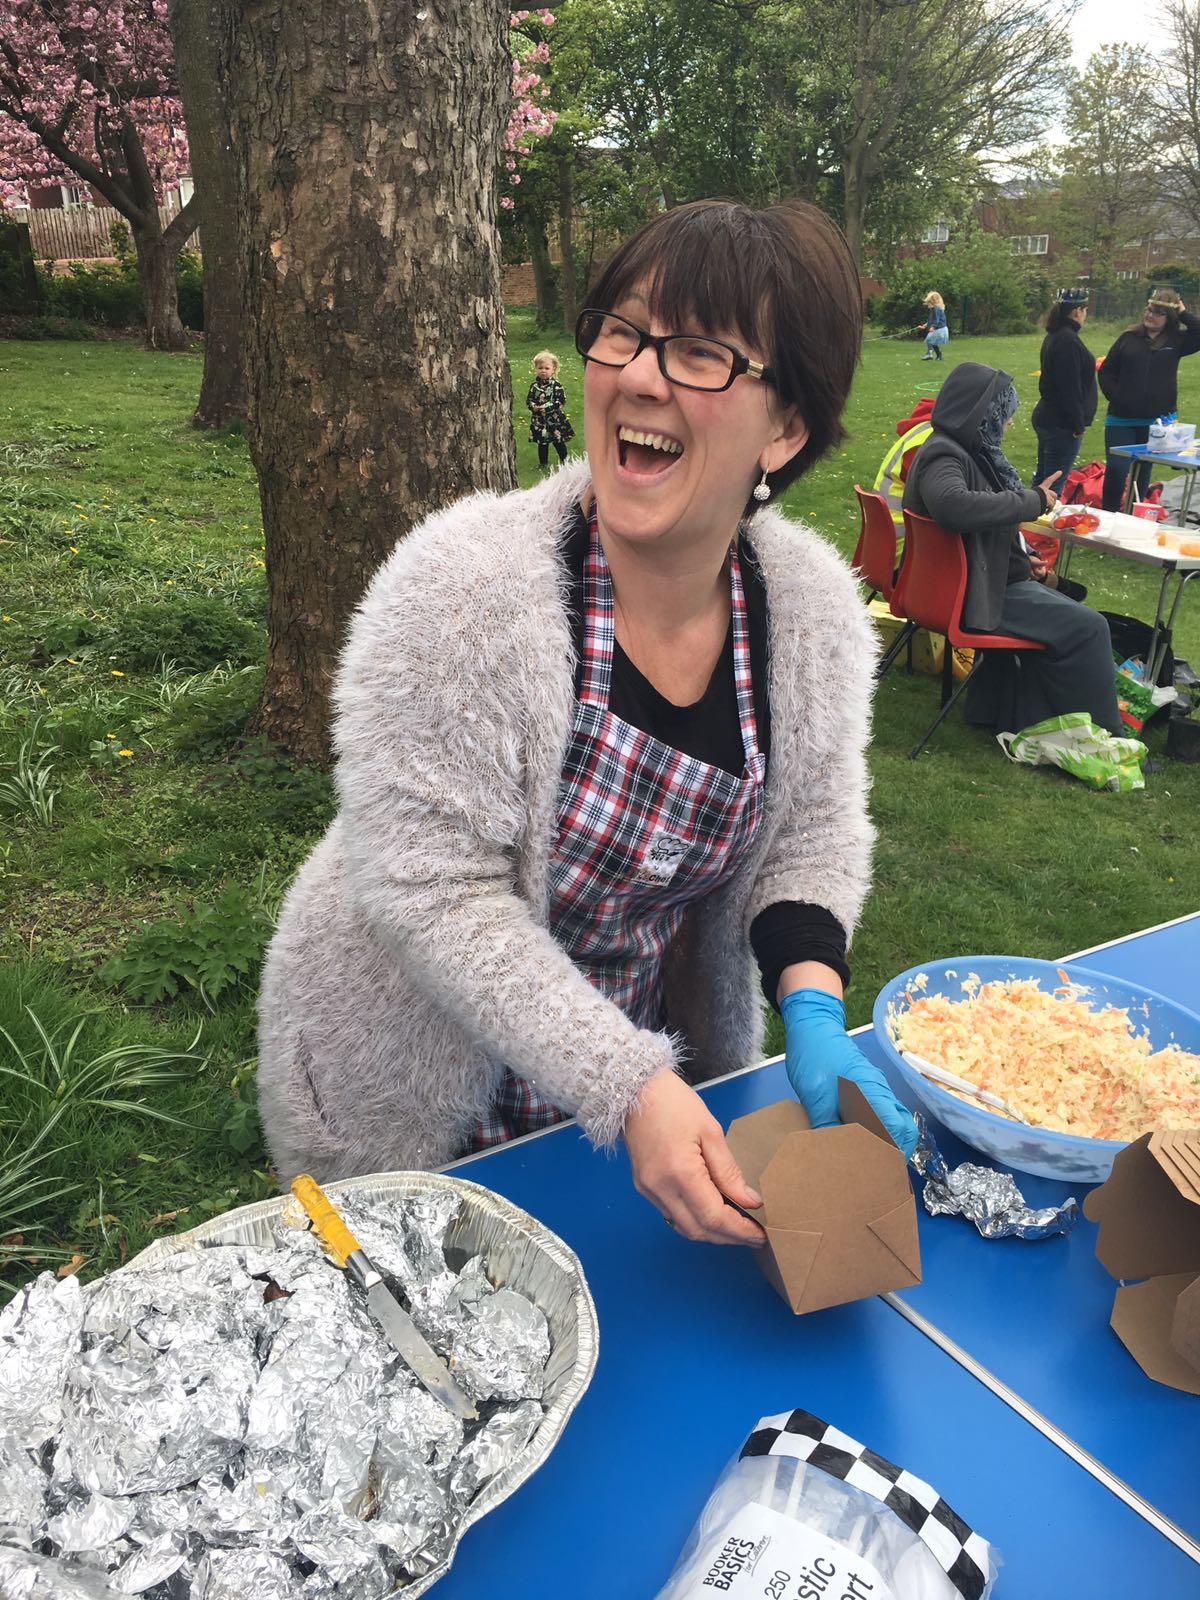 EE Elswick Park Event - Susan the Cook.jpeg